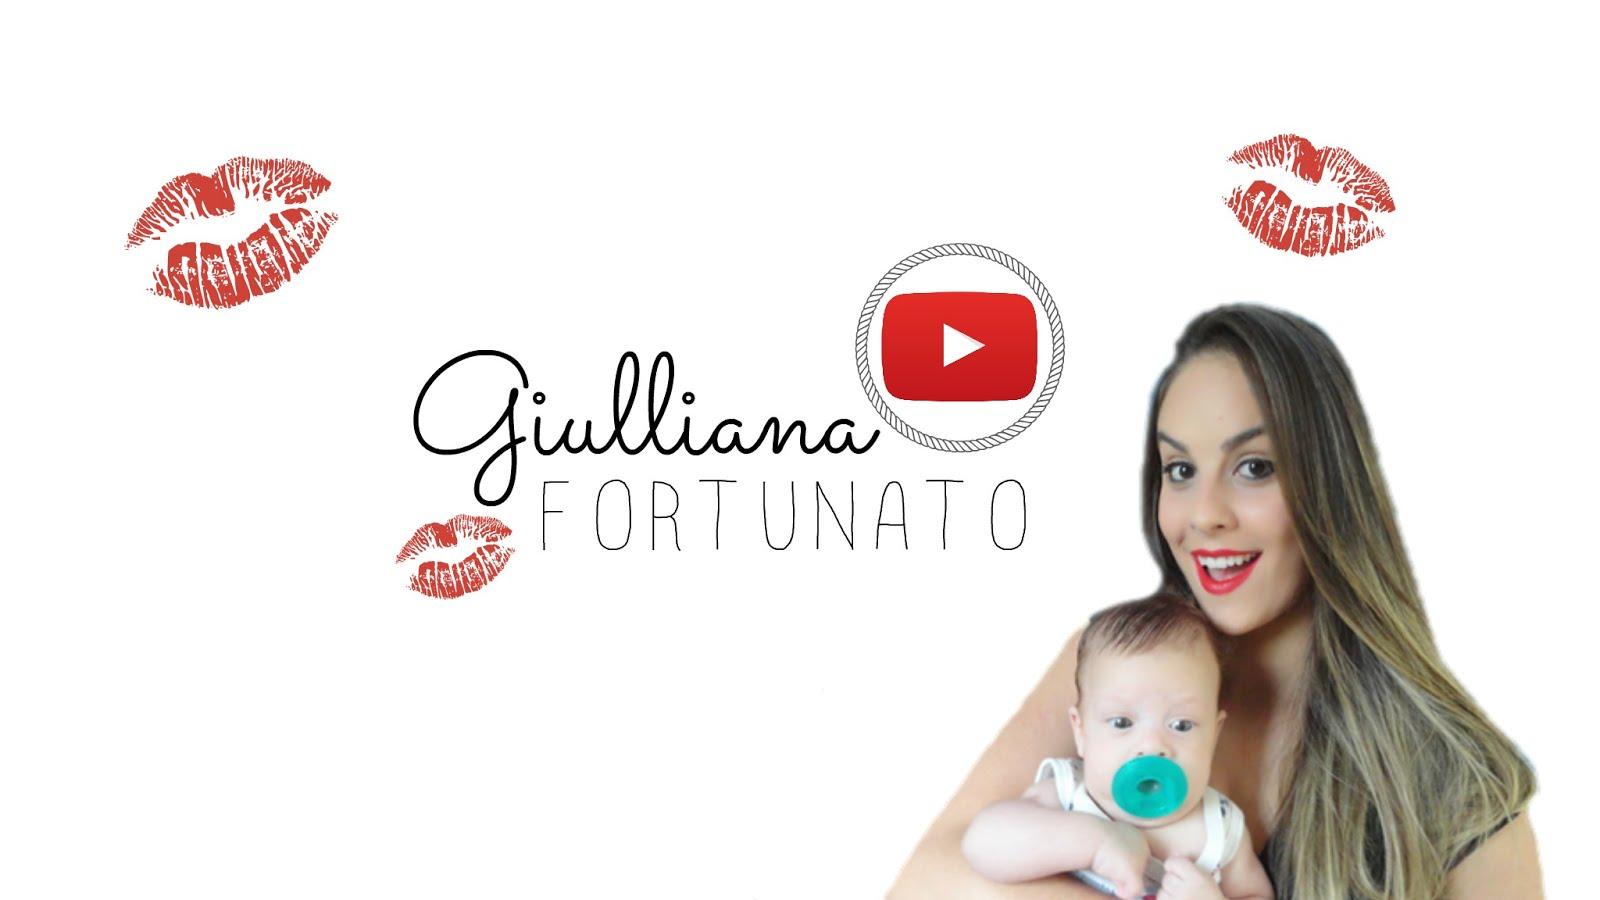 Giulliana Fortunato